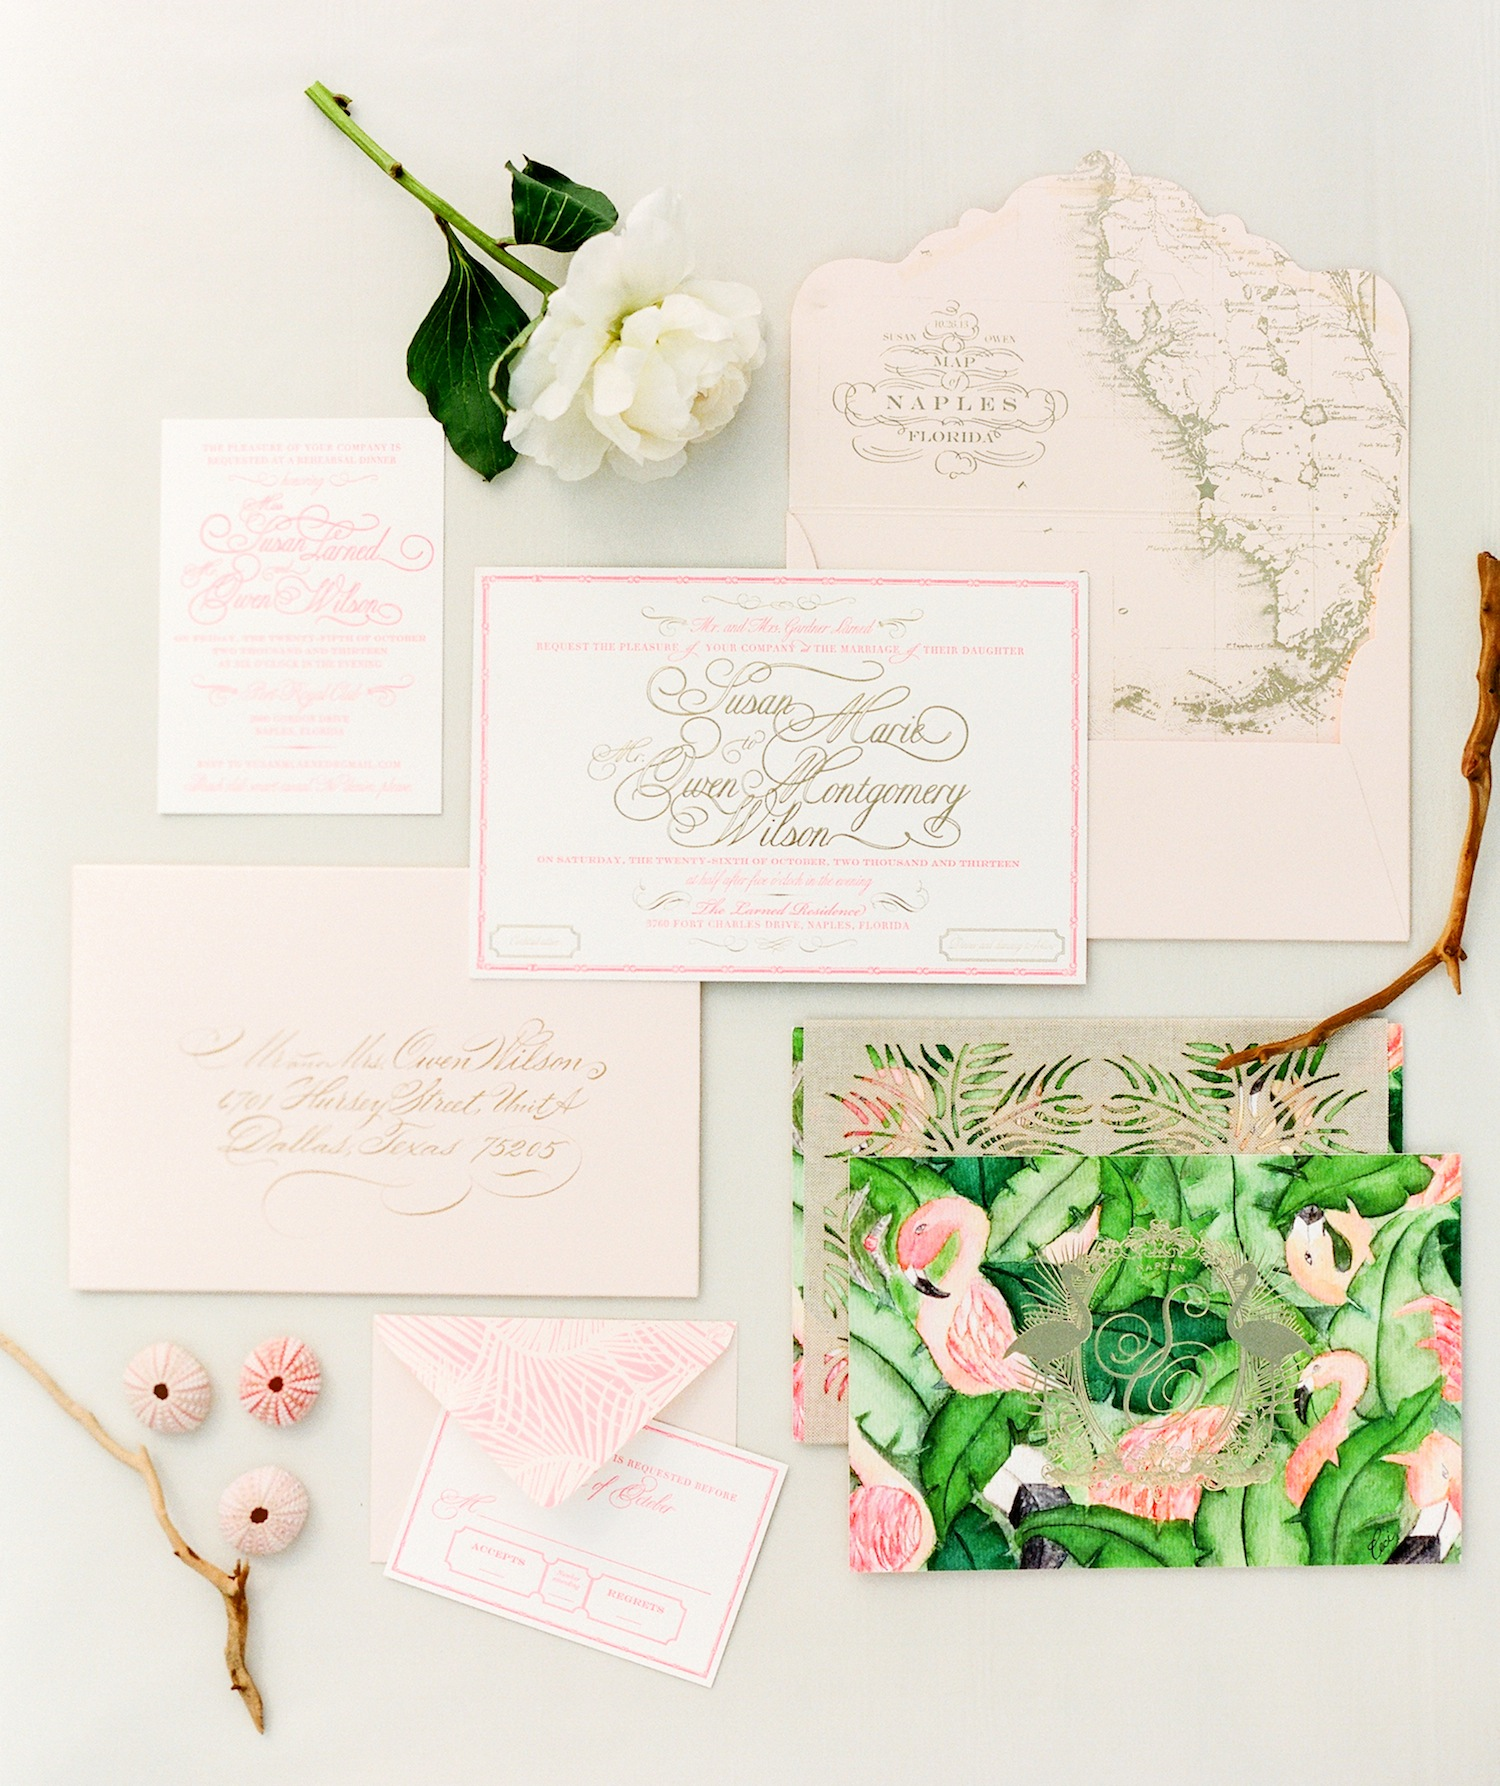 tropical destination wedding invitations with map motif